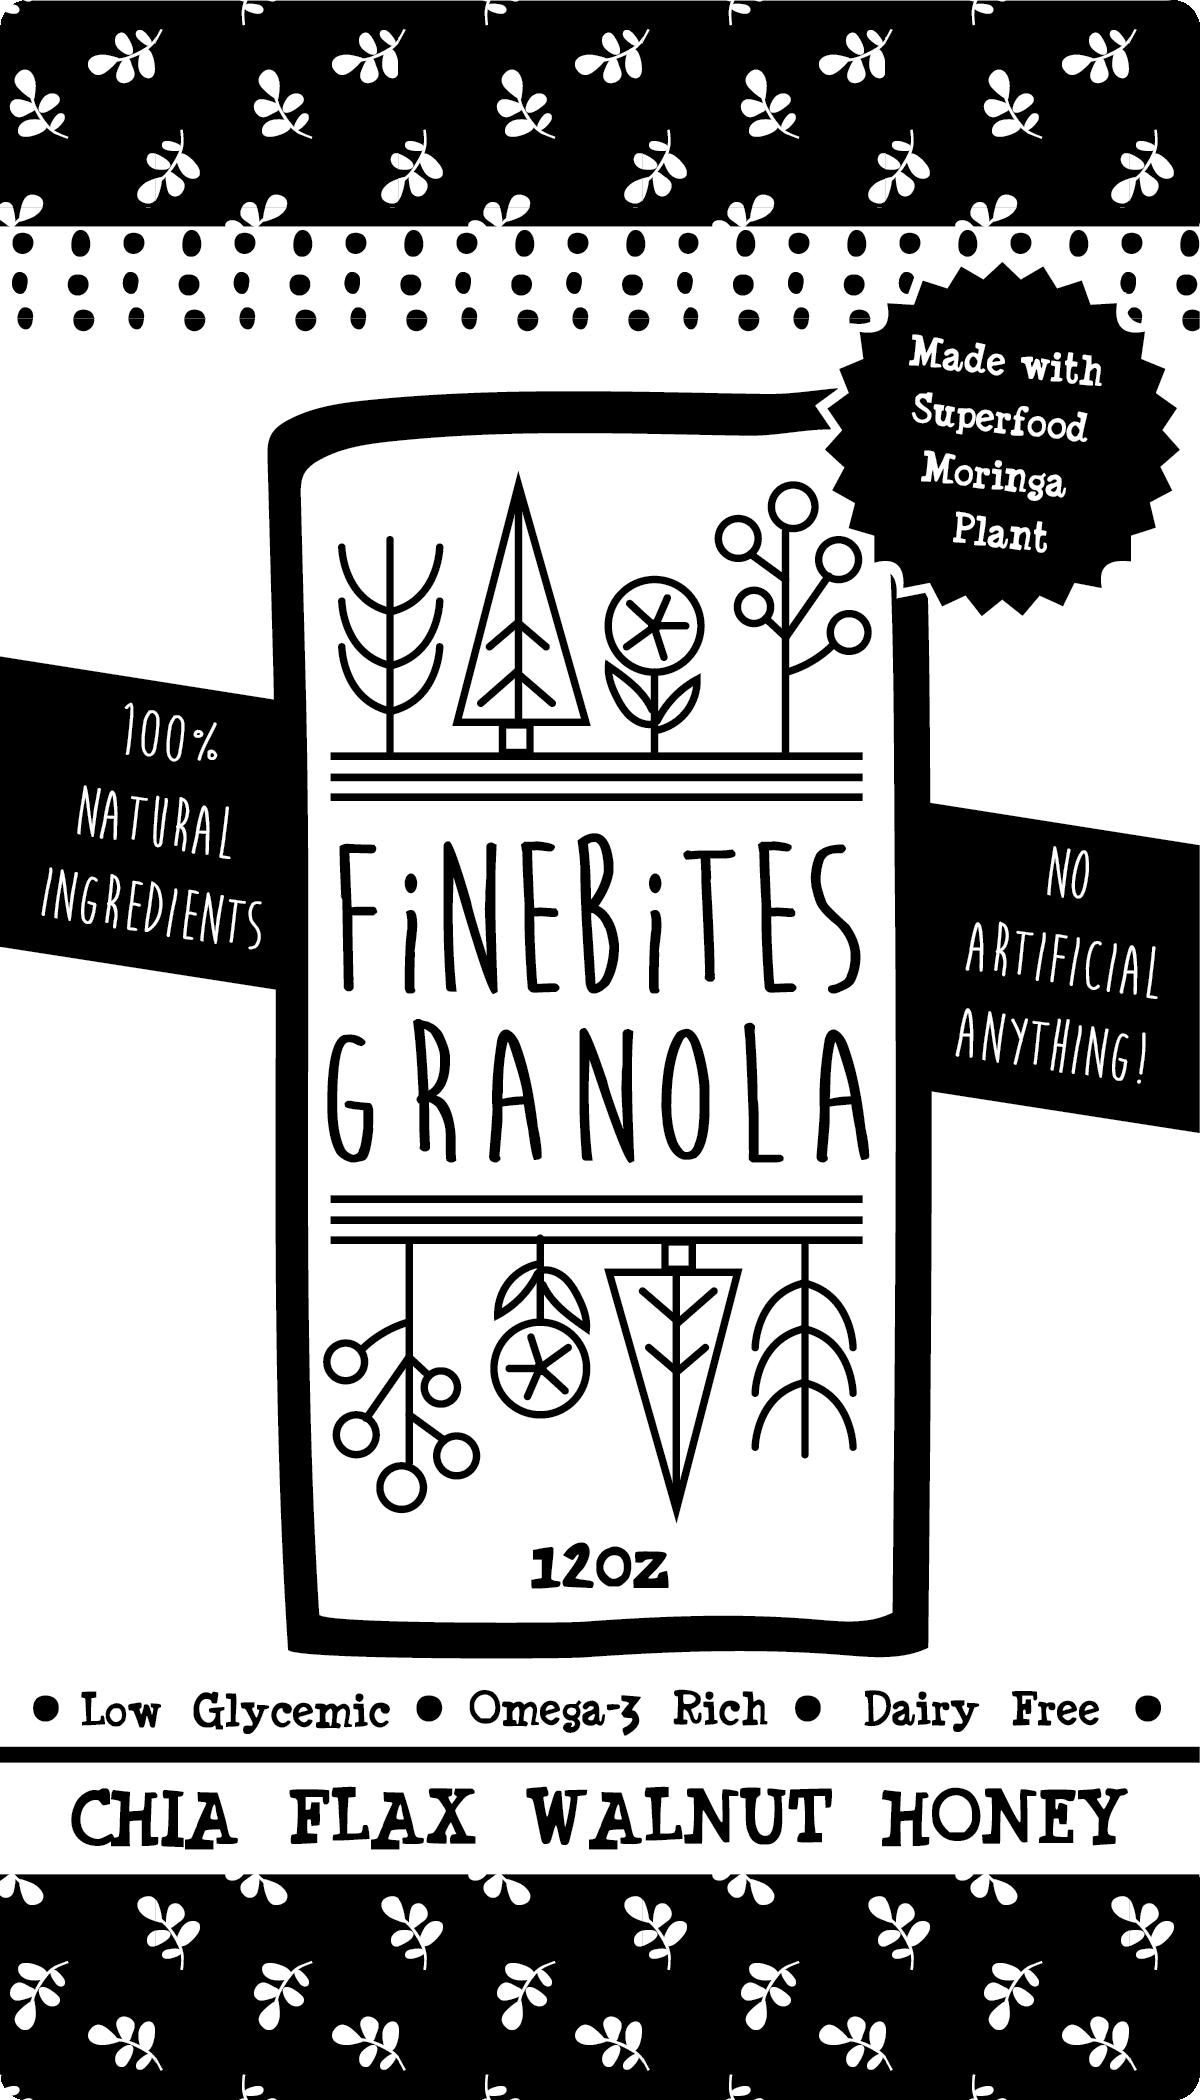 FineBites Granola